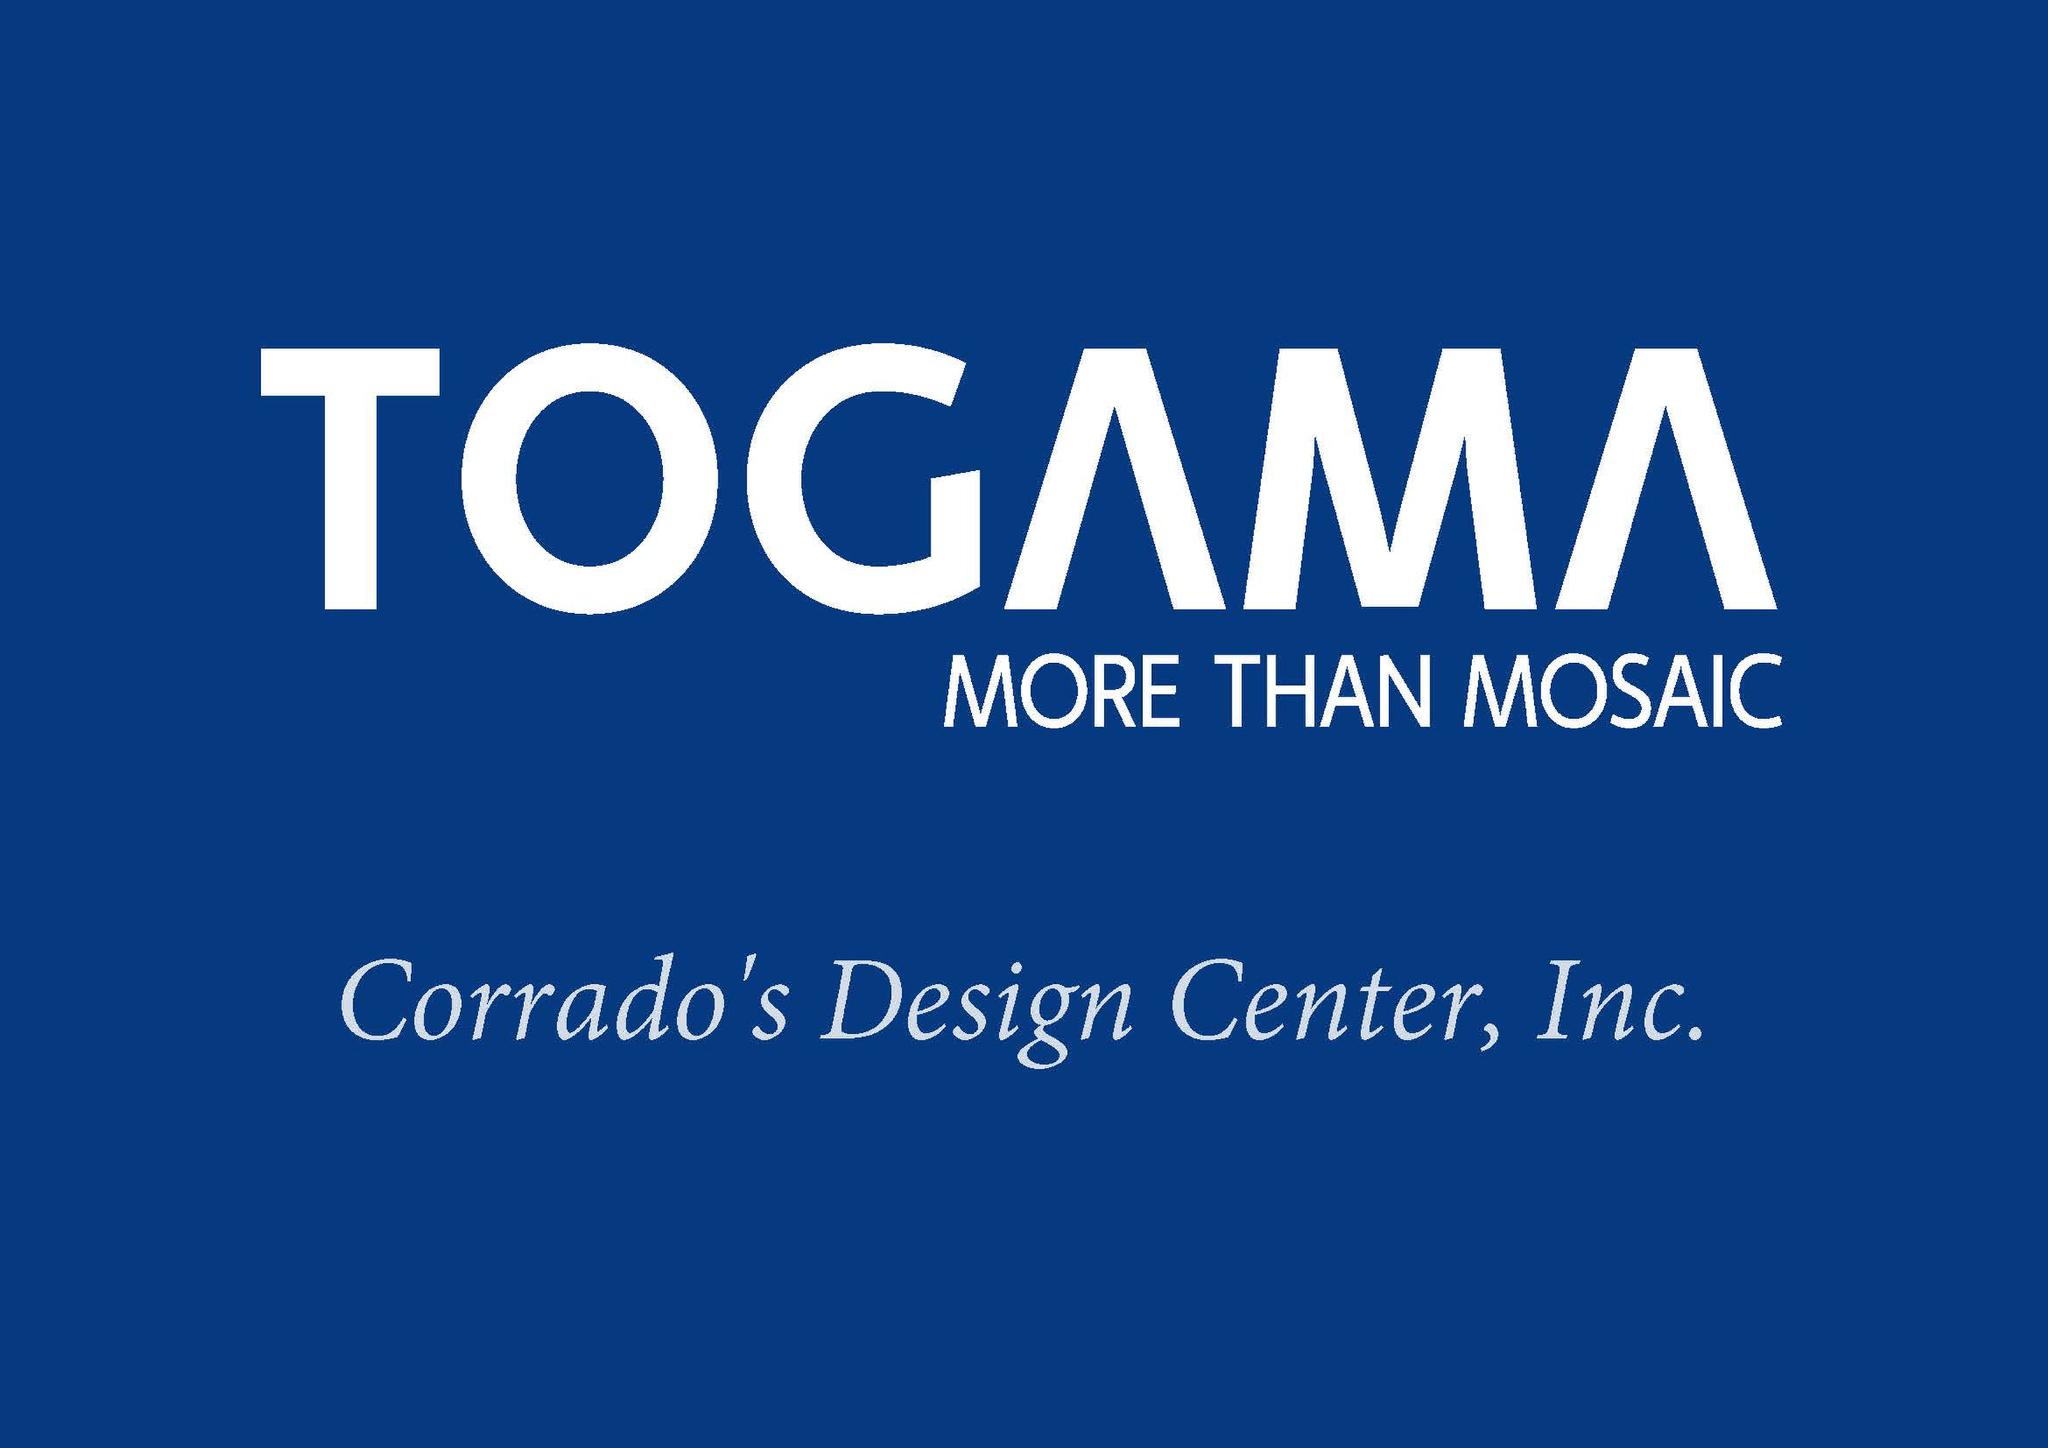 TOGAMA / Corrado's